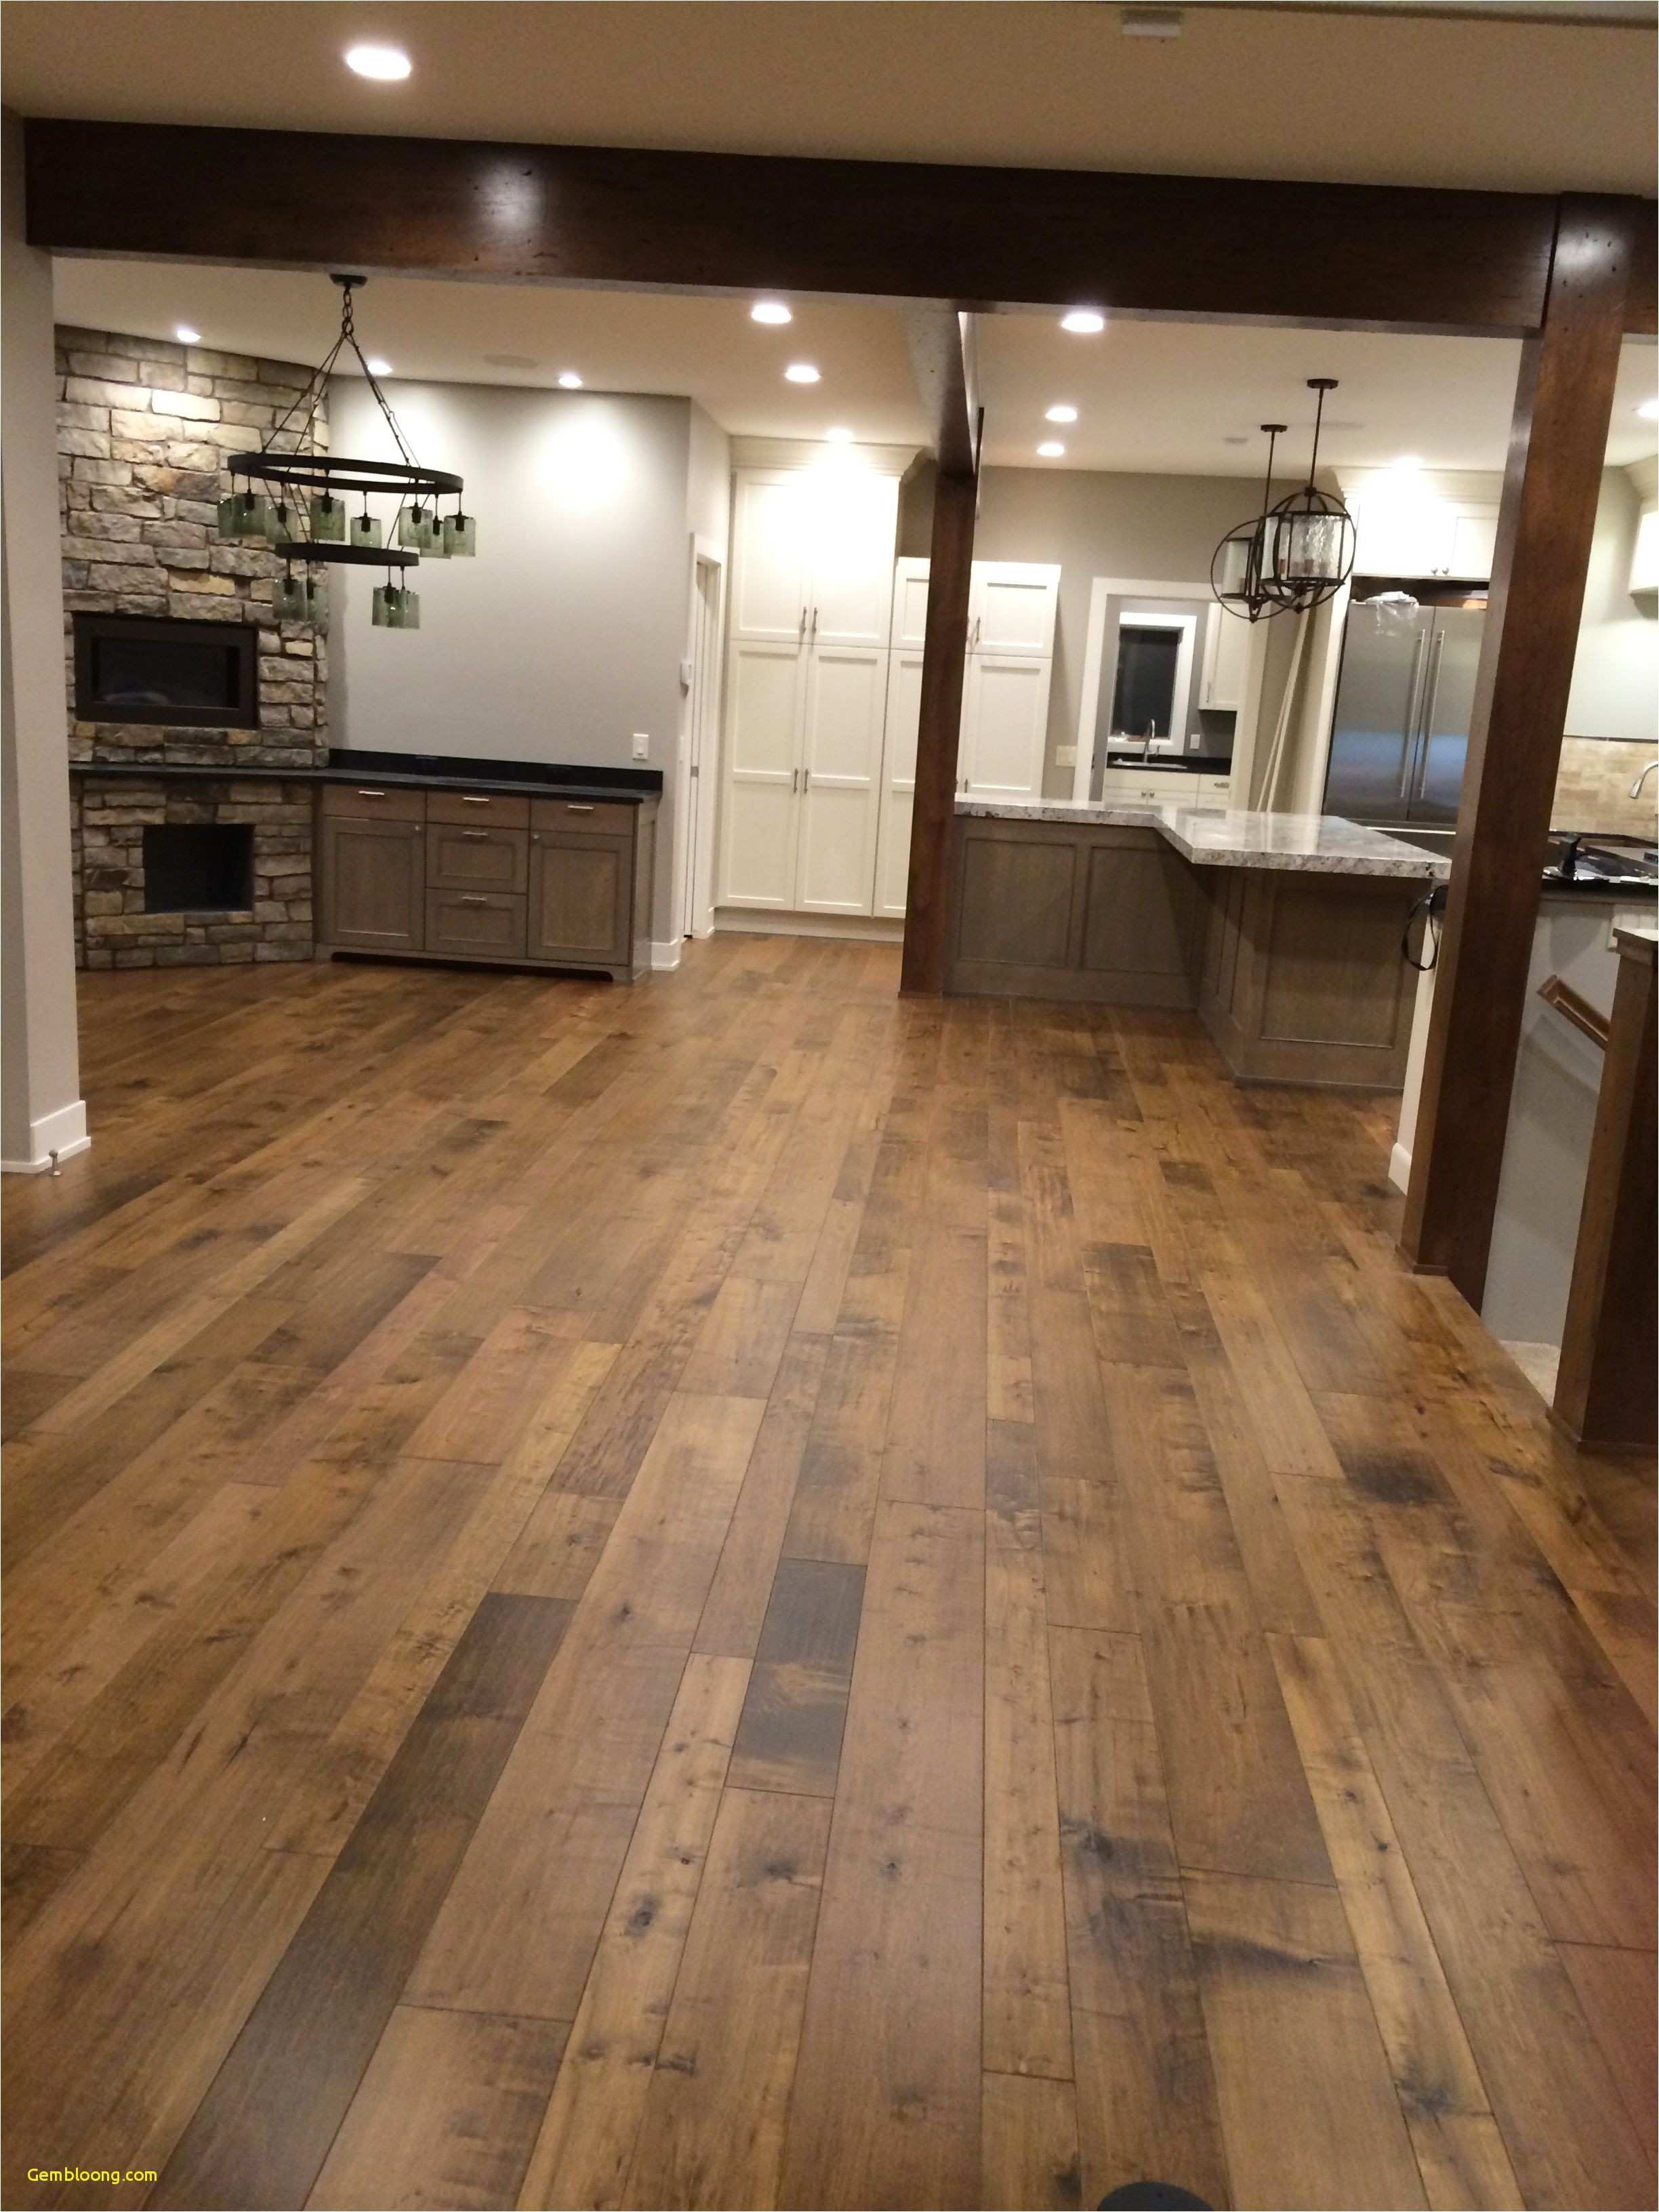 cheap hardwood flooring nj of wood for floors facesinnature within hardwood flooring stores near me hardwood flooring panies near me flooring sale near me stock 0d